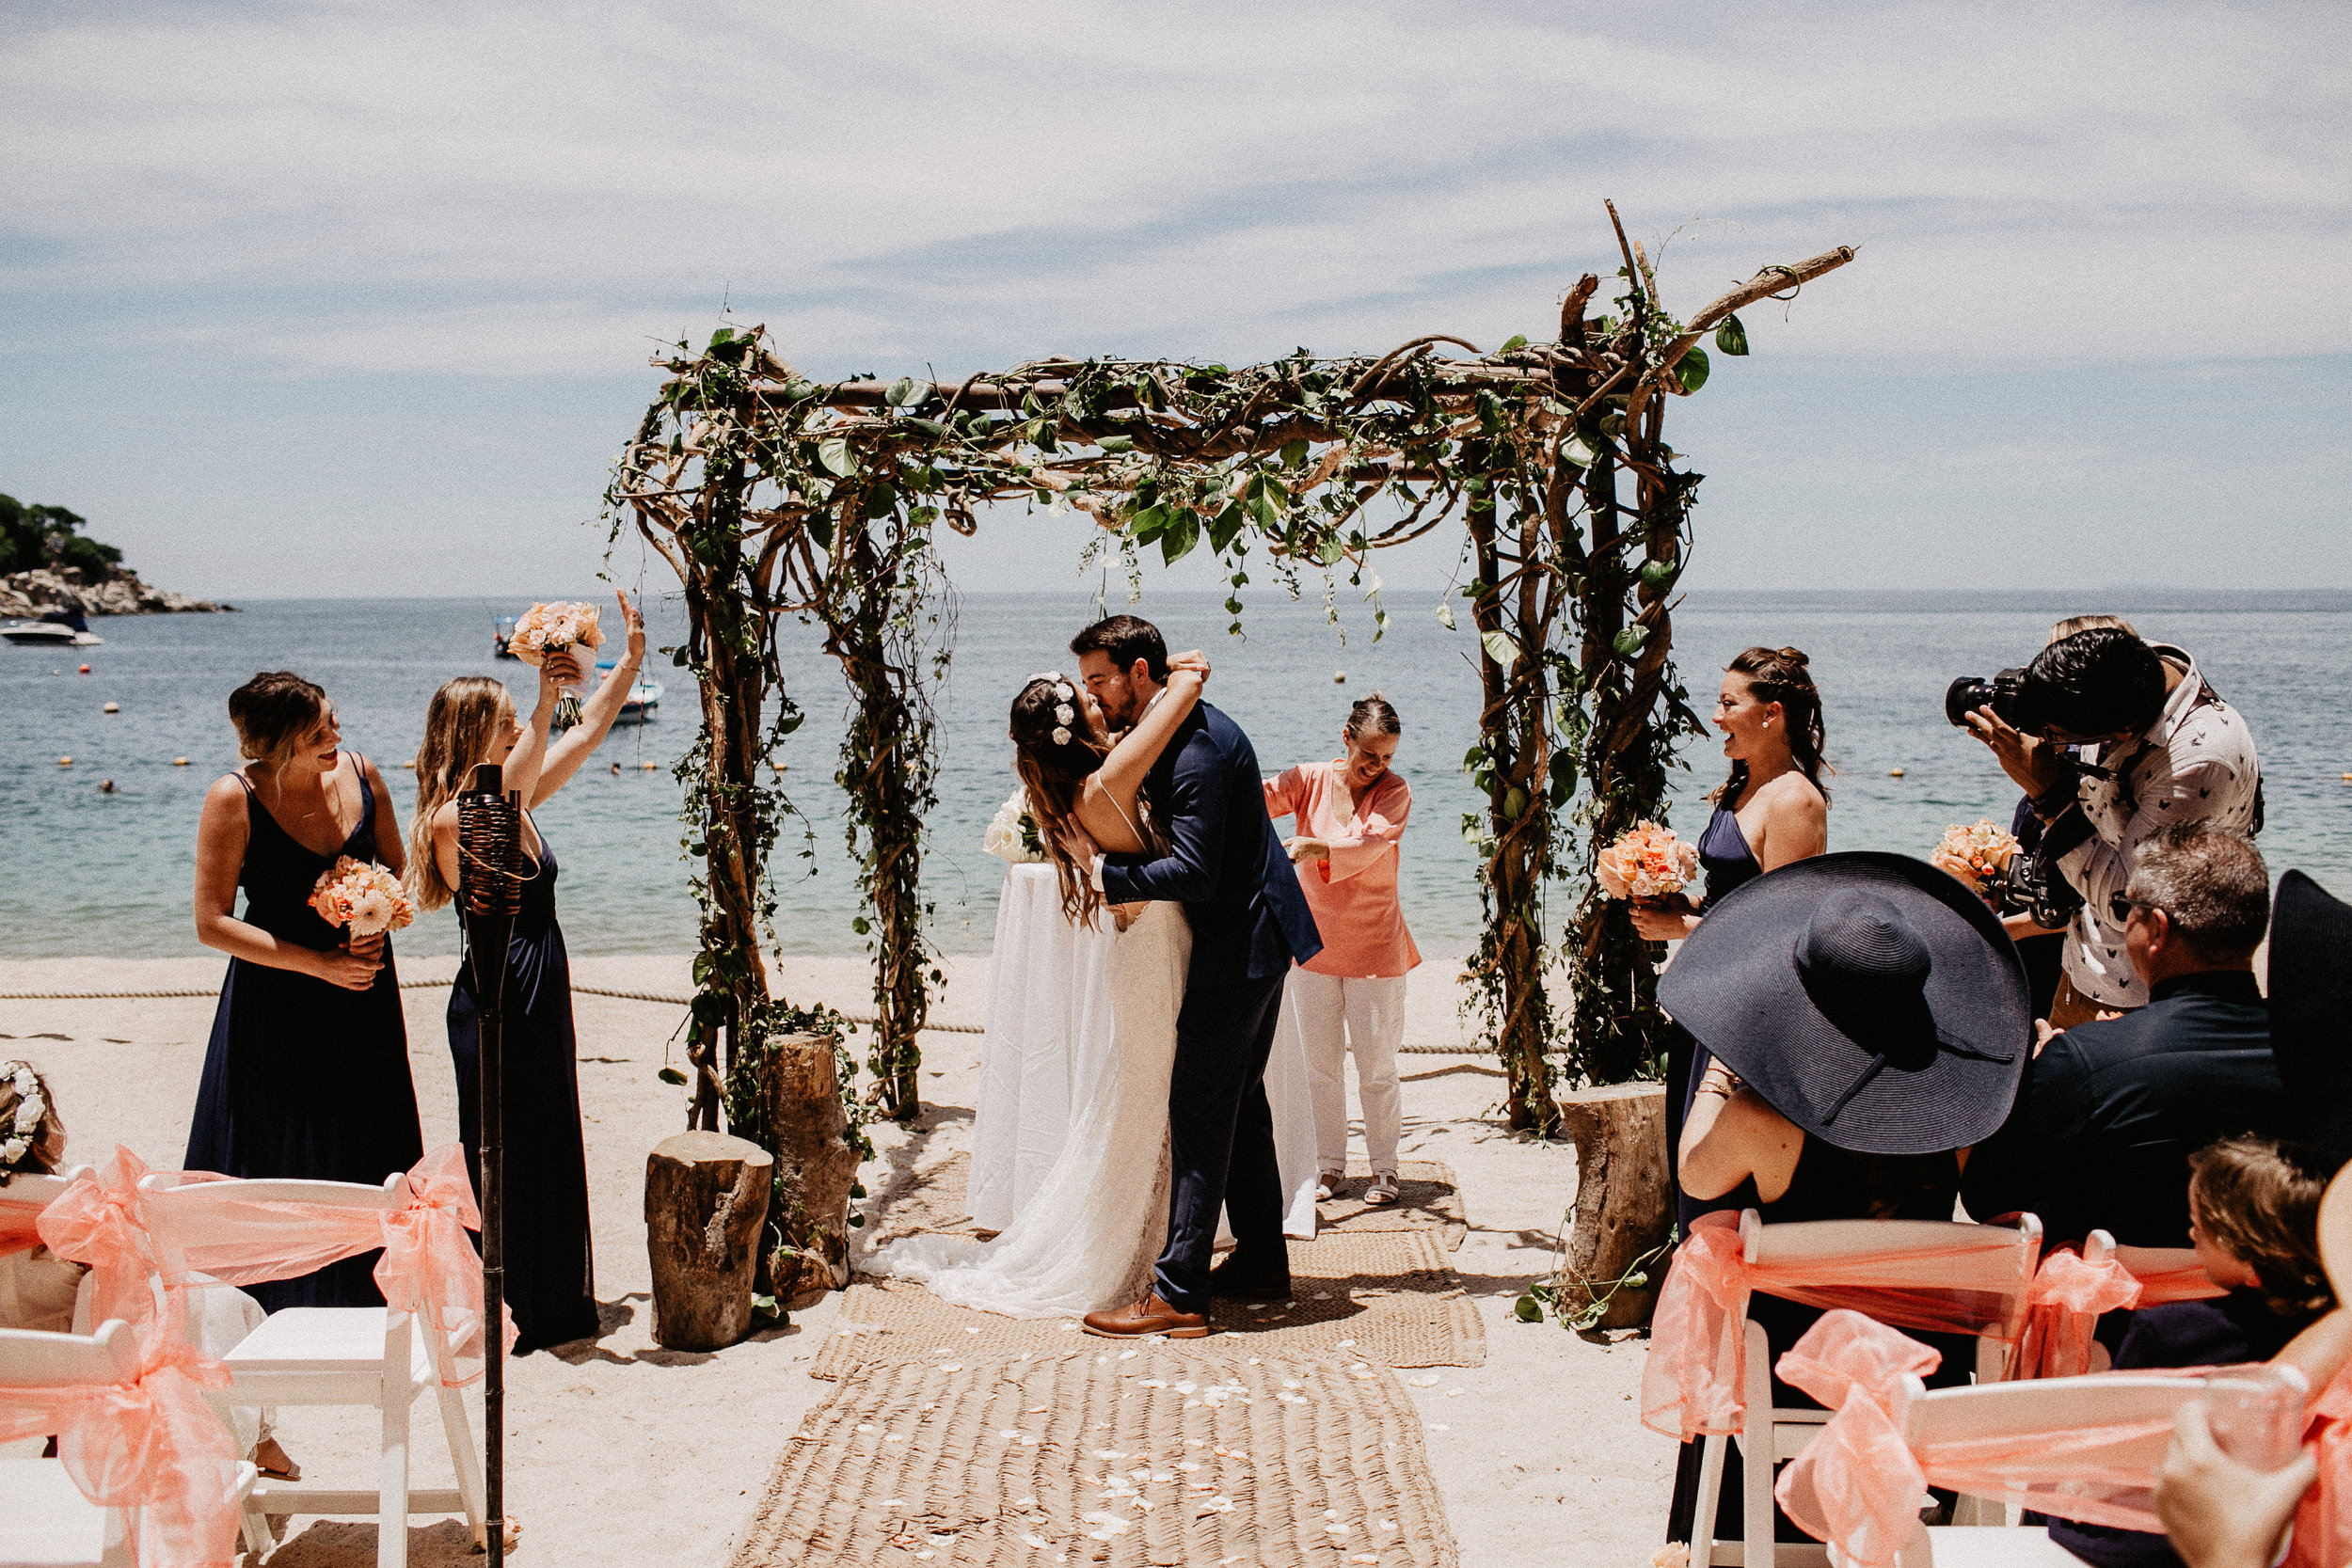 alfonso_flores_destination_wedding_photography_puerto_vallarta_hotel_barcelo_vallarta_cuttler_amela-256.JPG